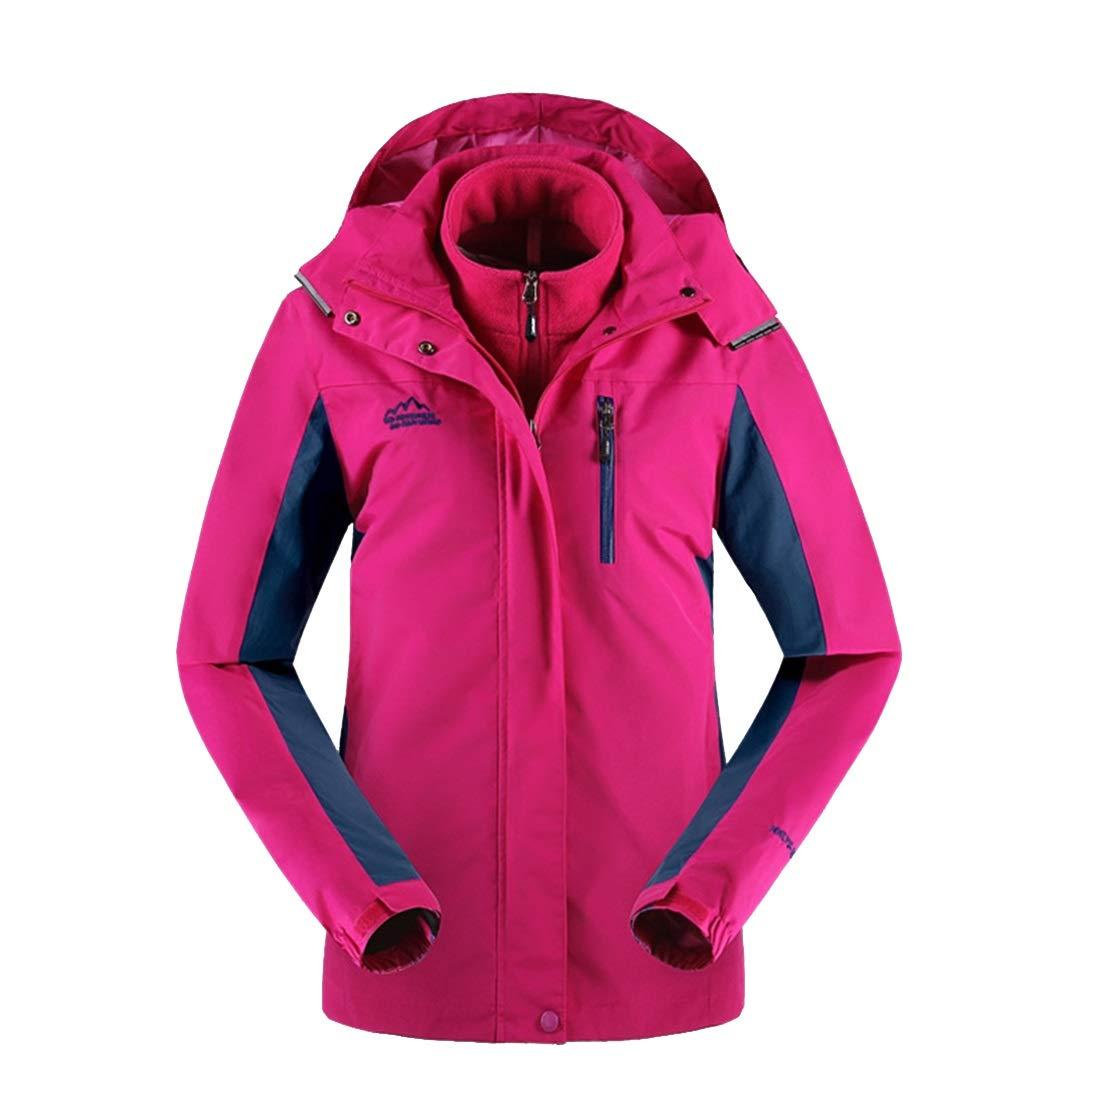 pinkcarmine AUSWIEI Winter Autumn Jacket Women's Threeinone TwoPiece Suit Breathable Plus Velvet Padded Jacket Jacket (color   bluee, Size   XXL)